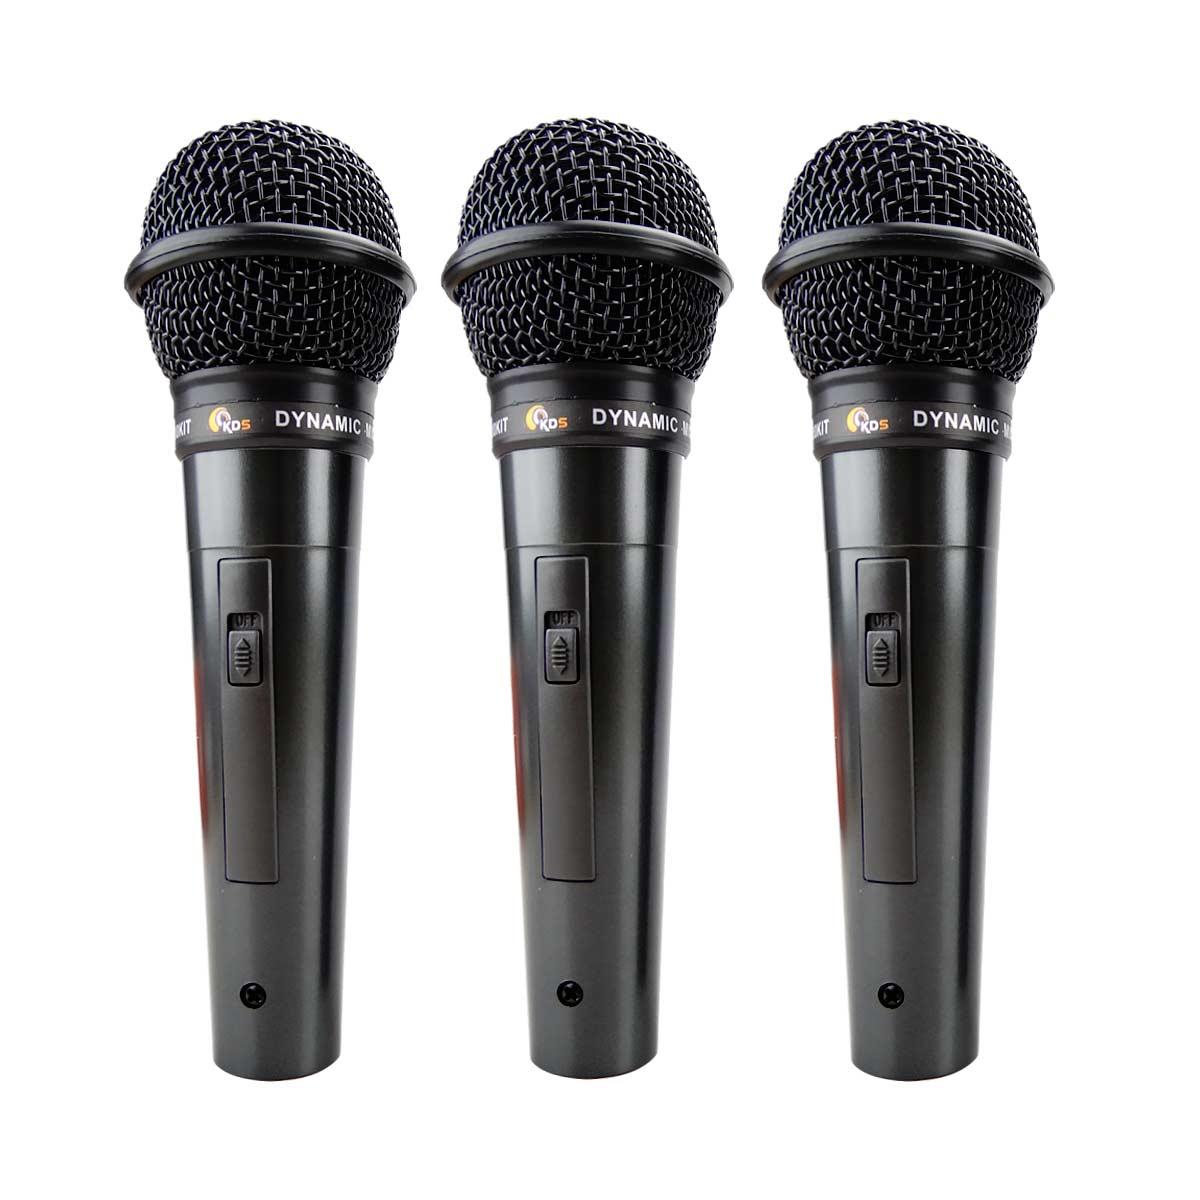 Kit de Microfones Kadosh  KDS-300